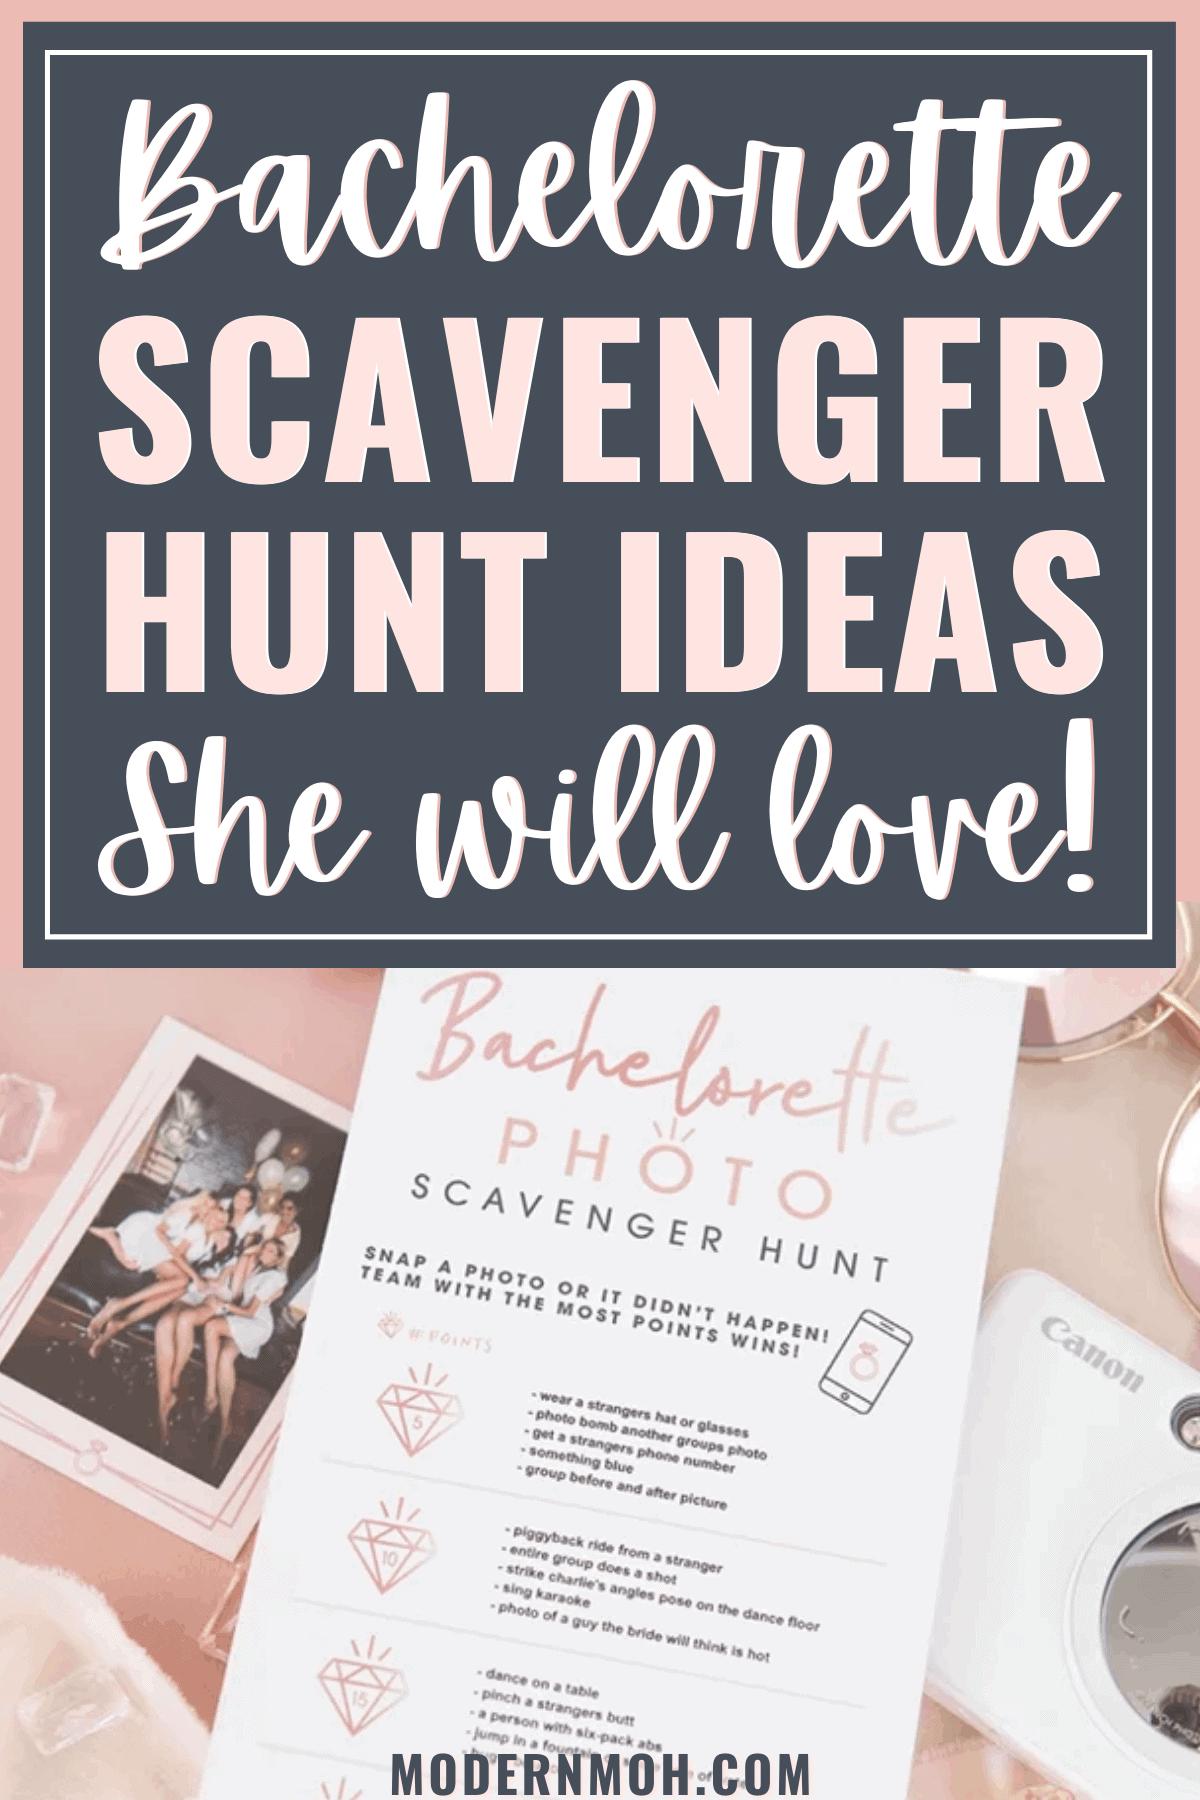 The Best Bachelorette Scavenger Hunt Ideas